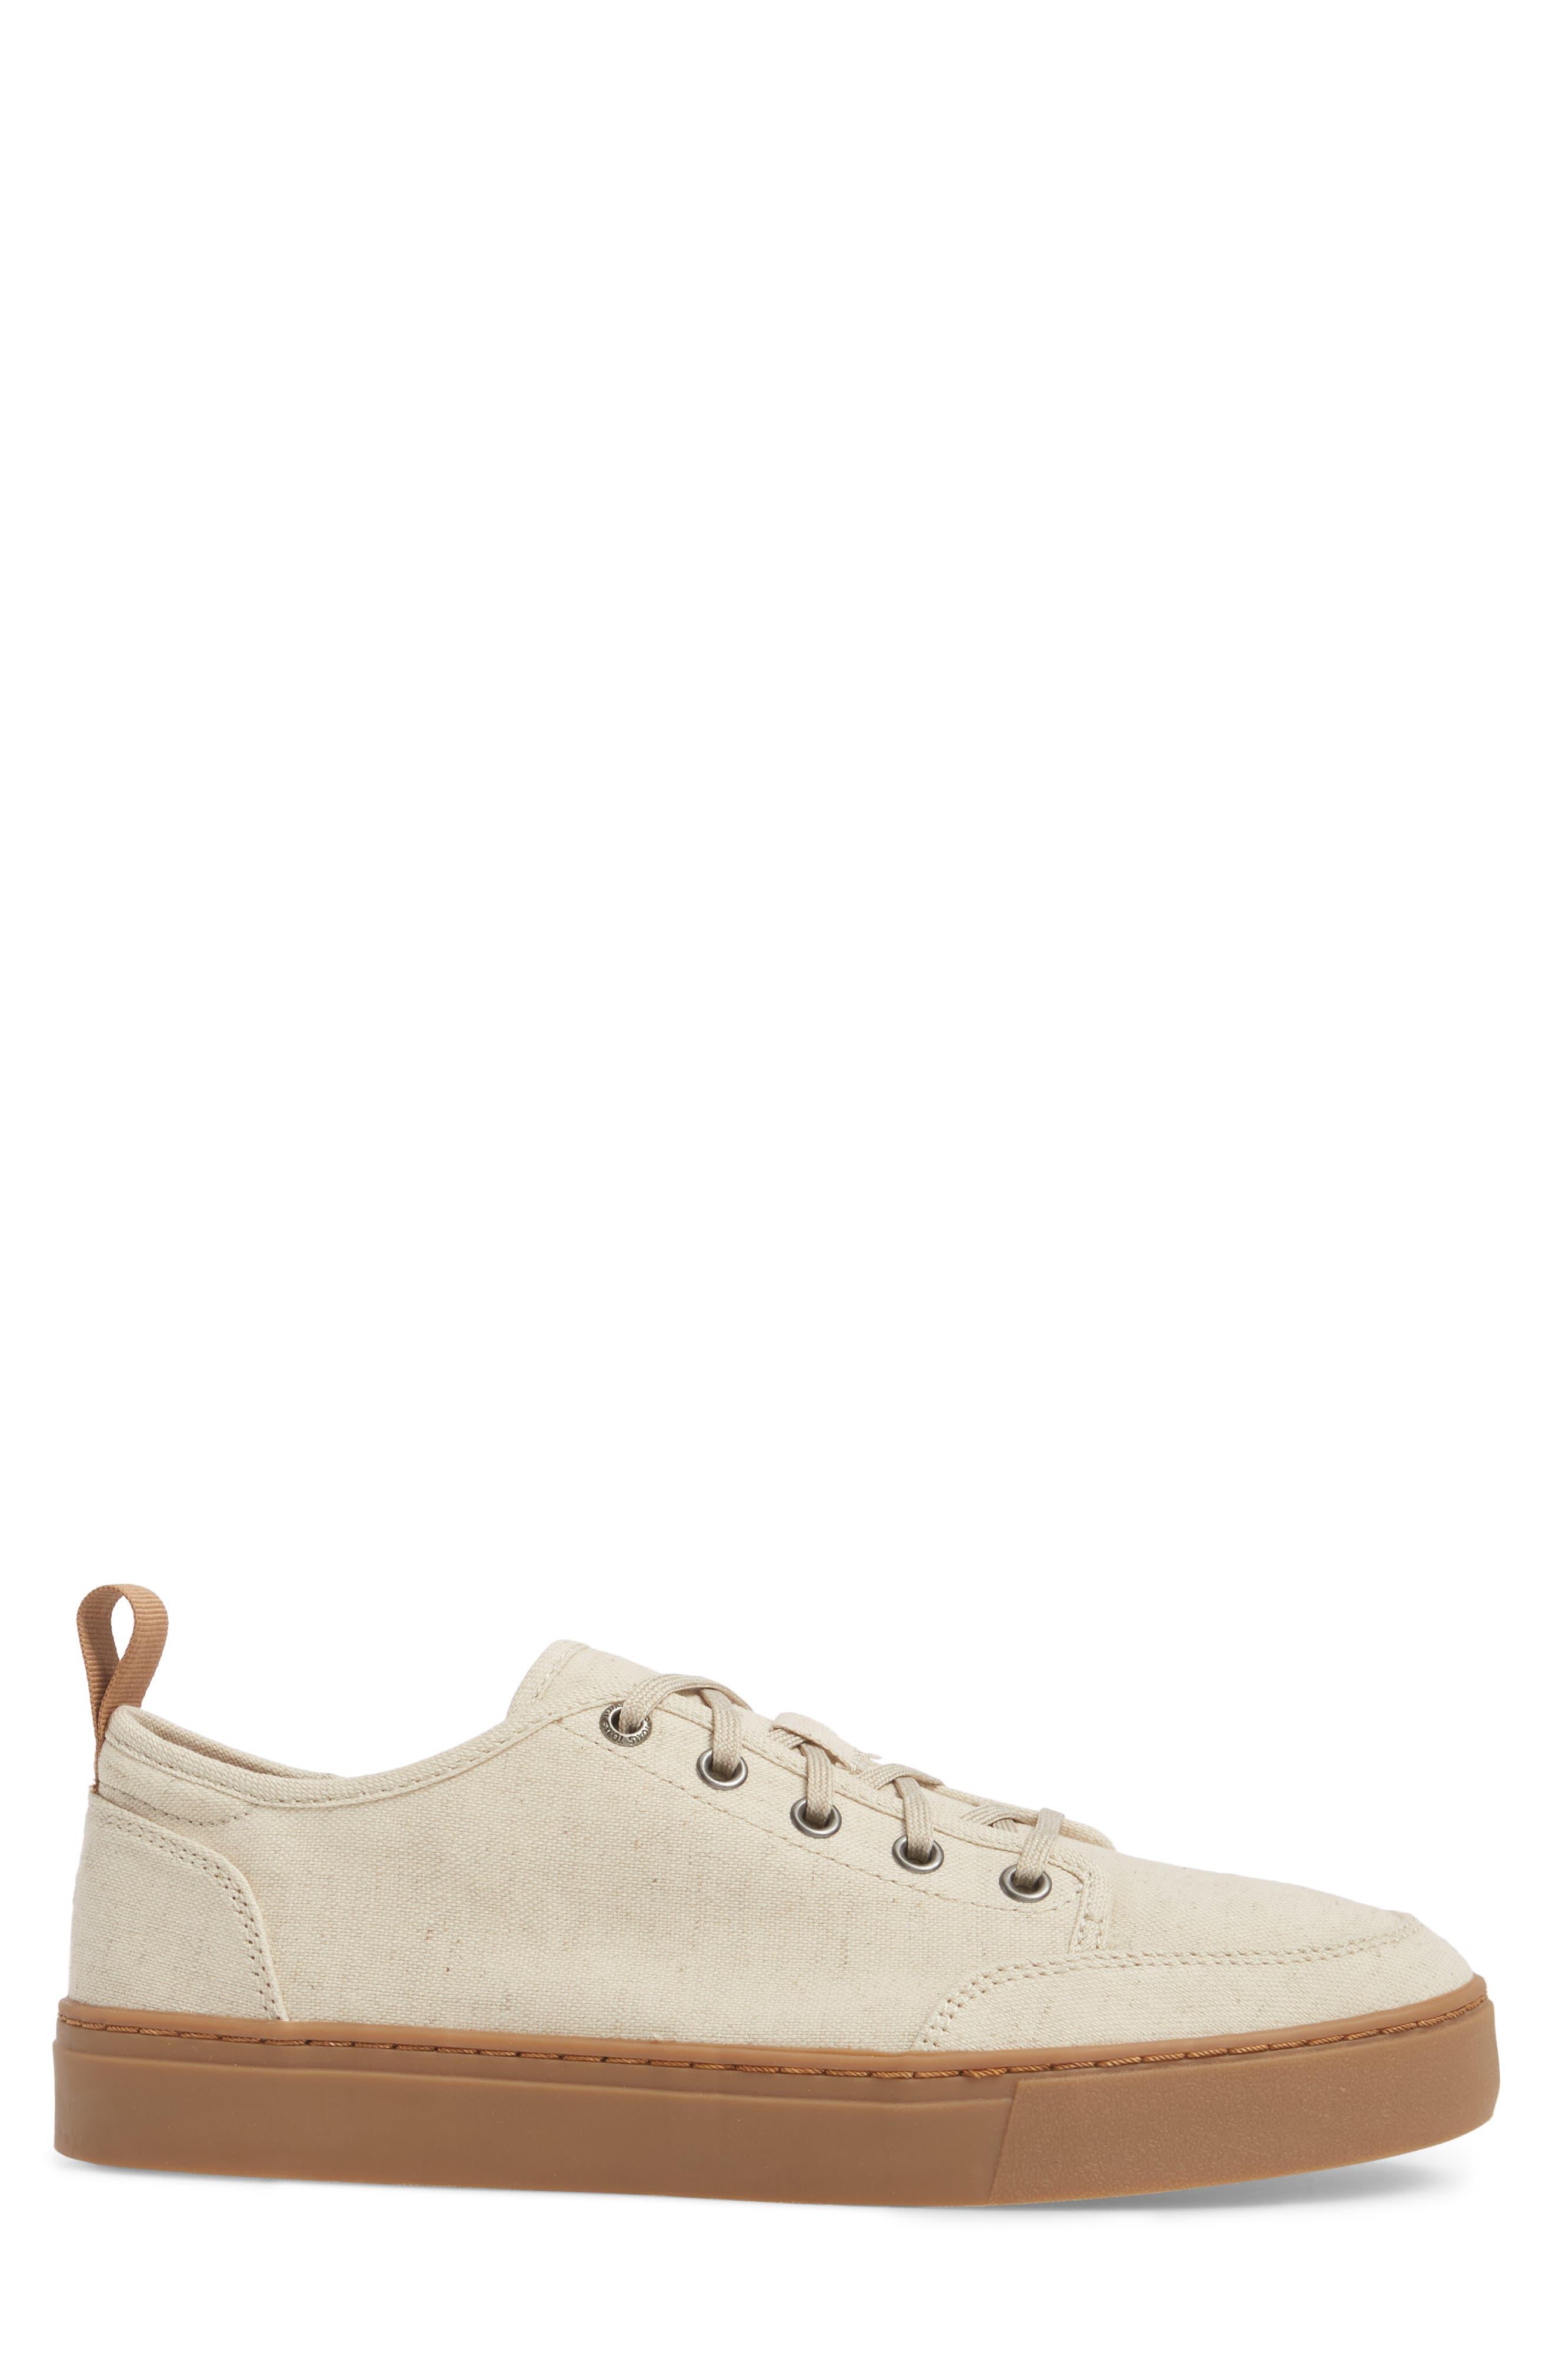 Landen Low Top Sneaker,                             Alternate thumbnail 3, color,                             NATURAL HEMP/ GUM